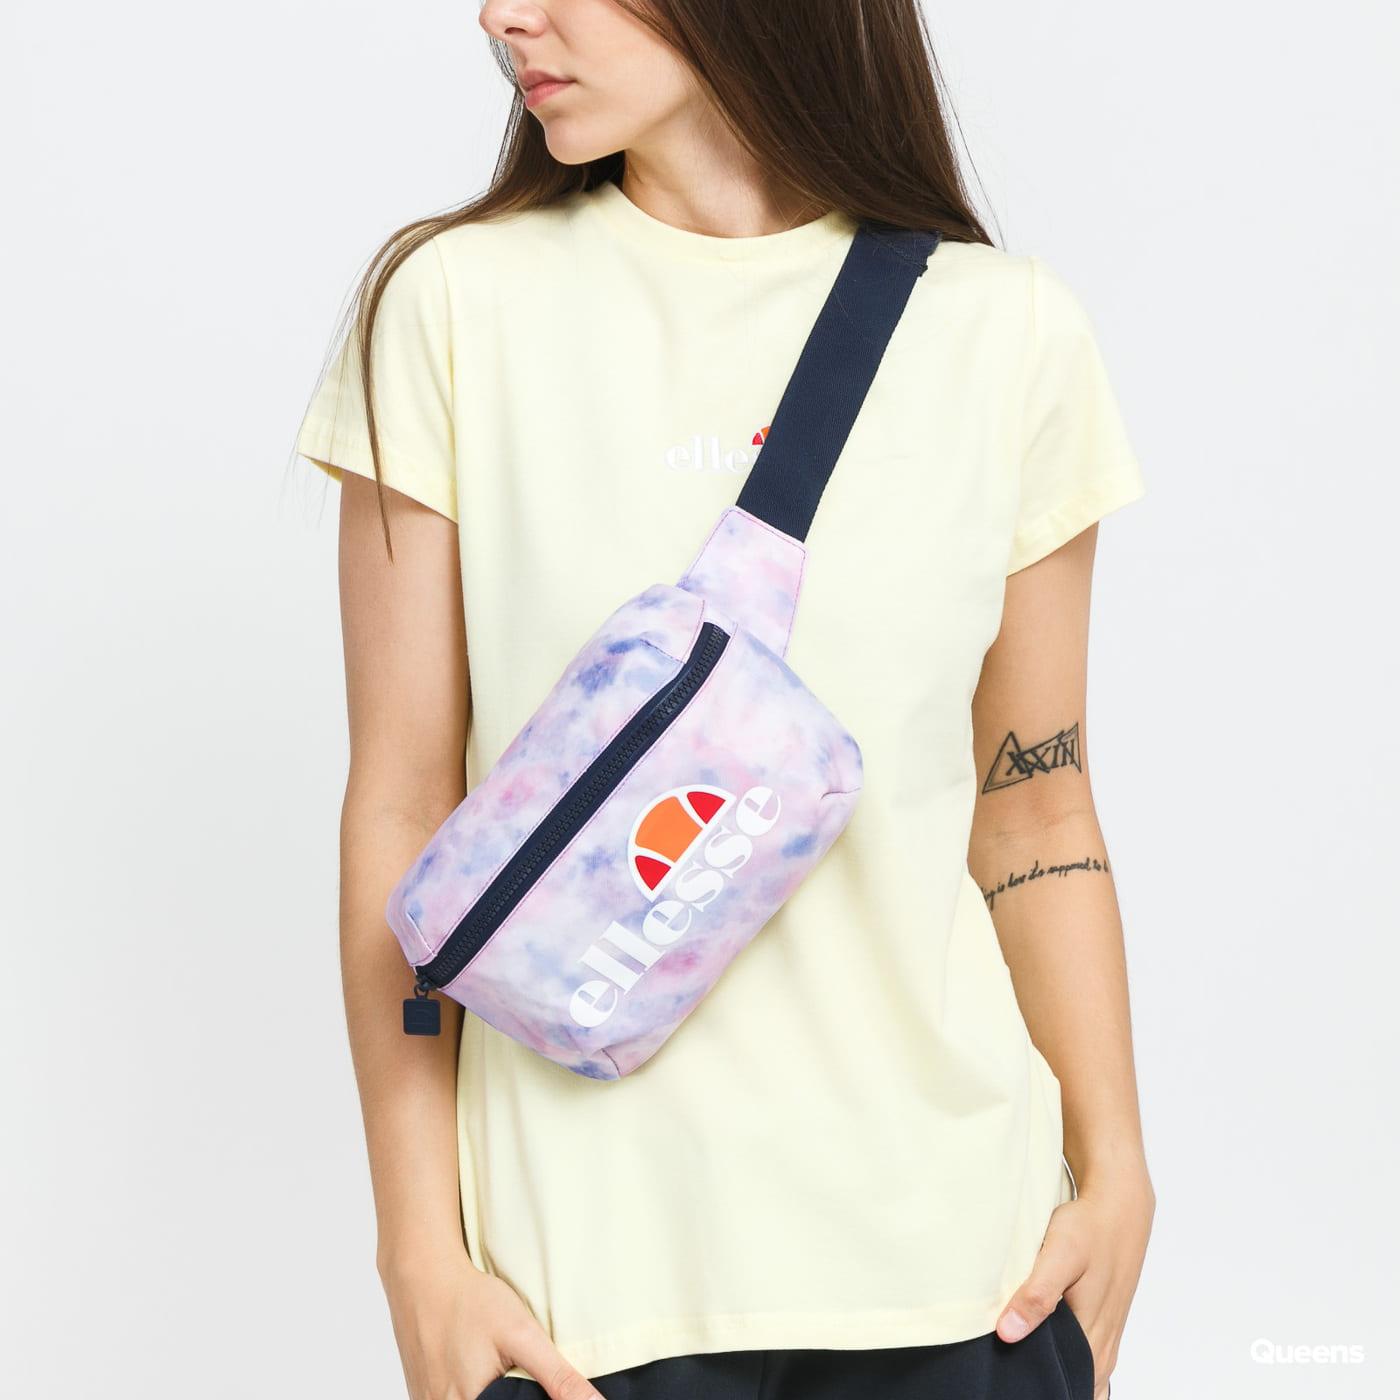 ellesse Rosca Cross Body Bag pink / navy